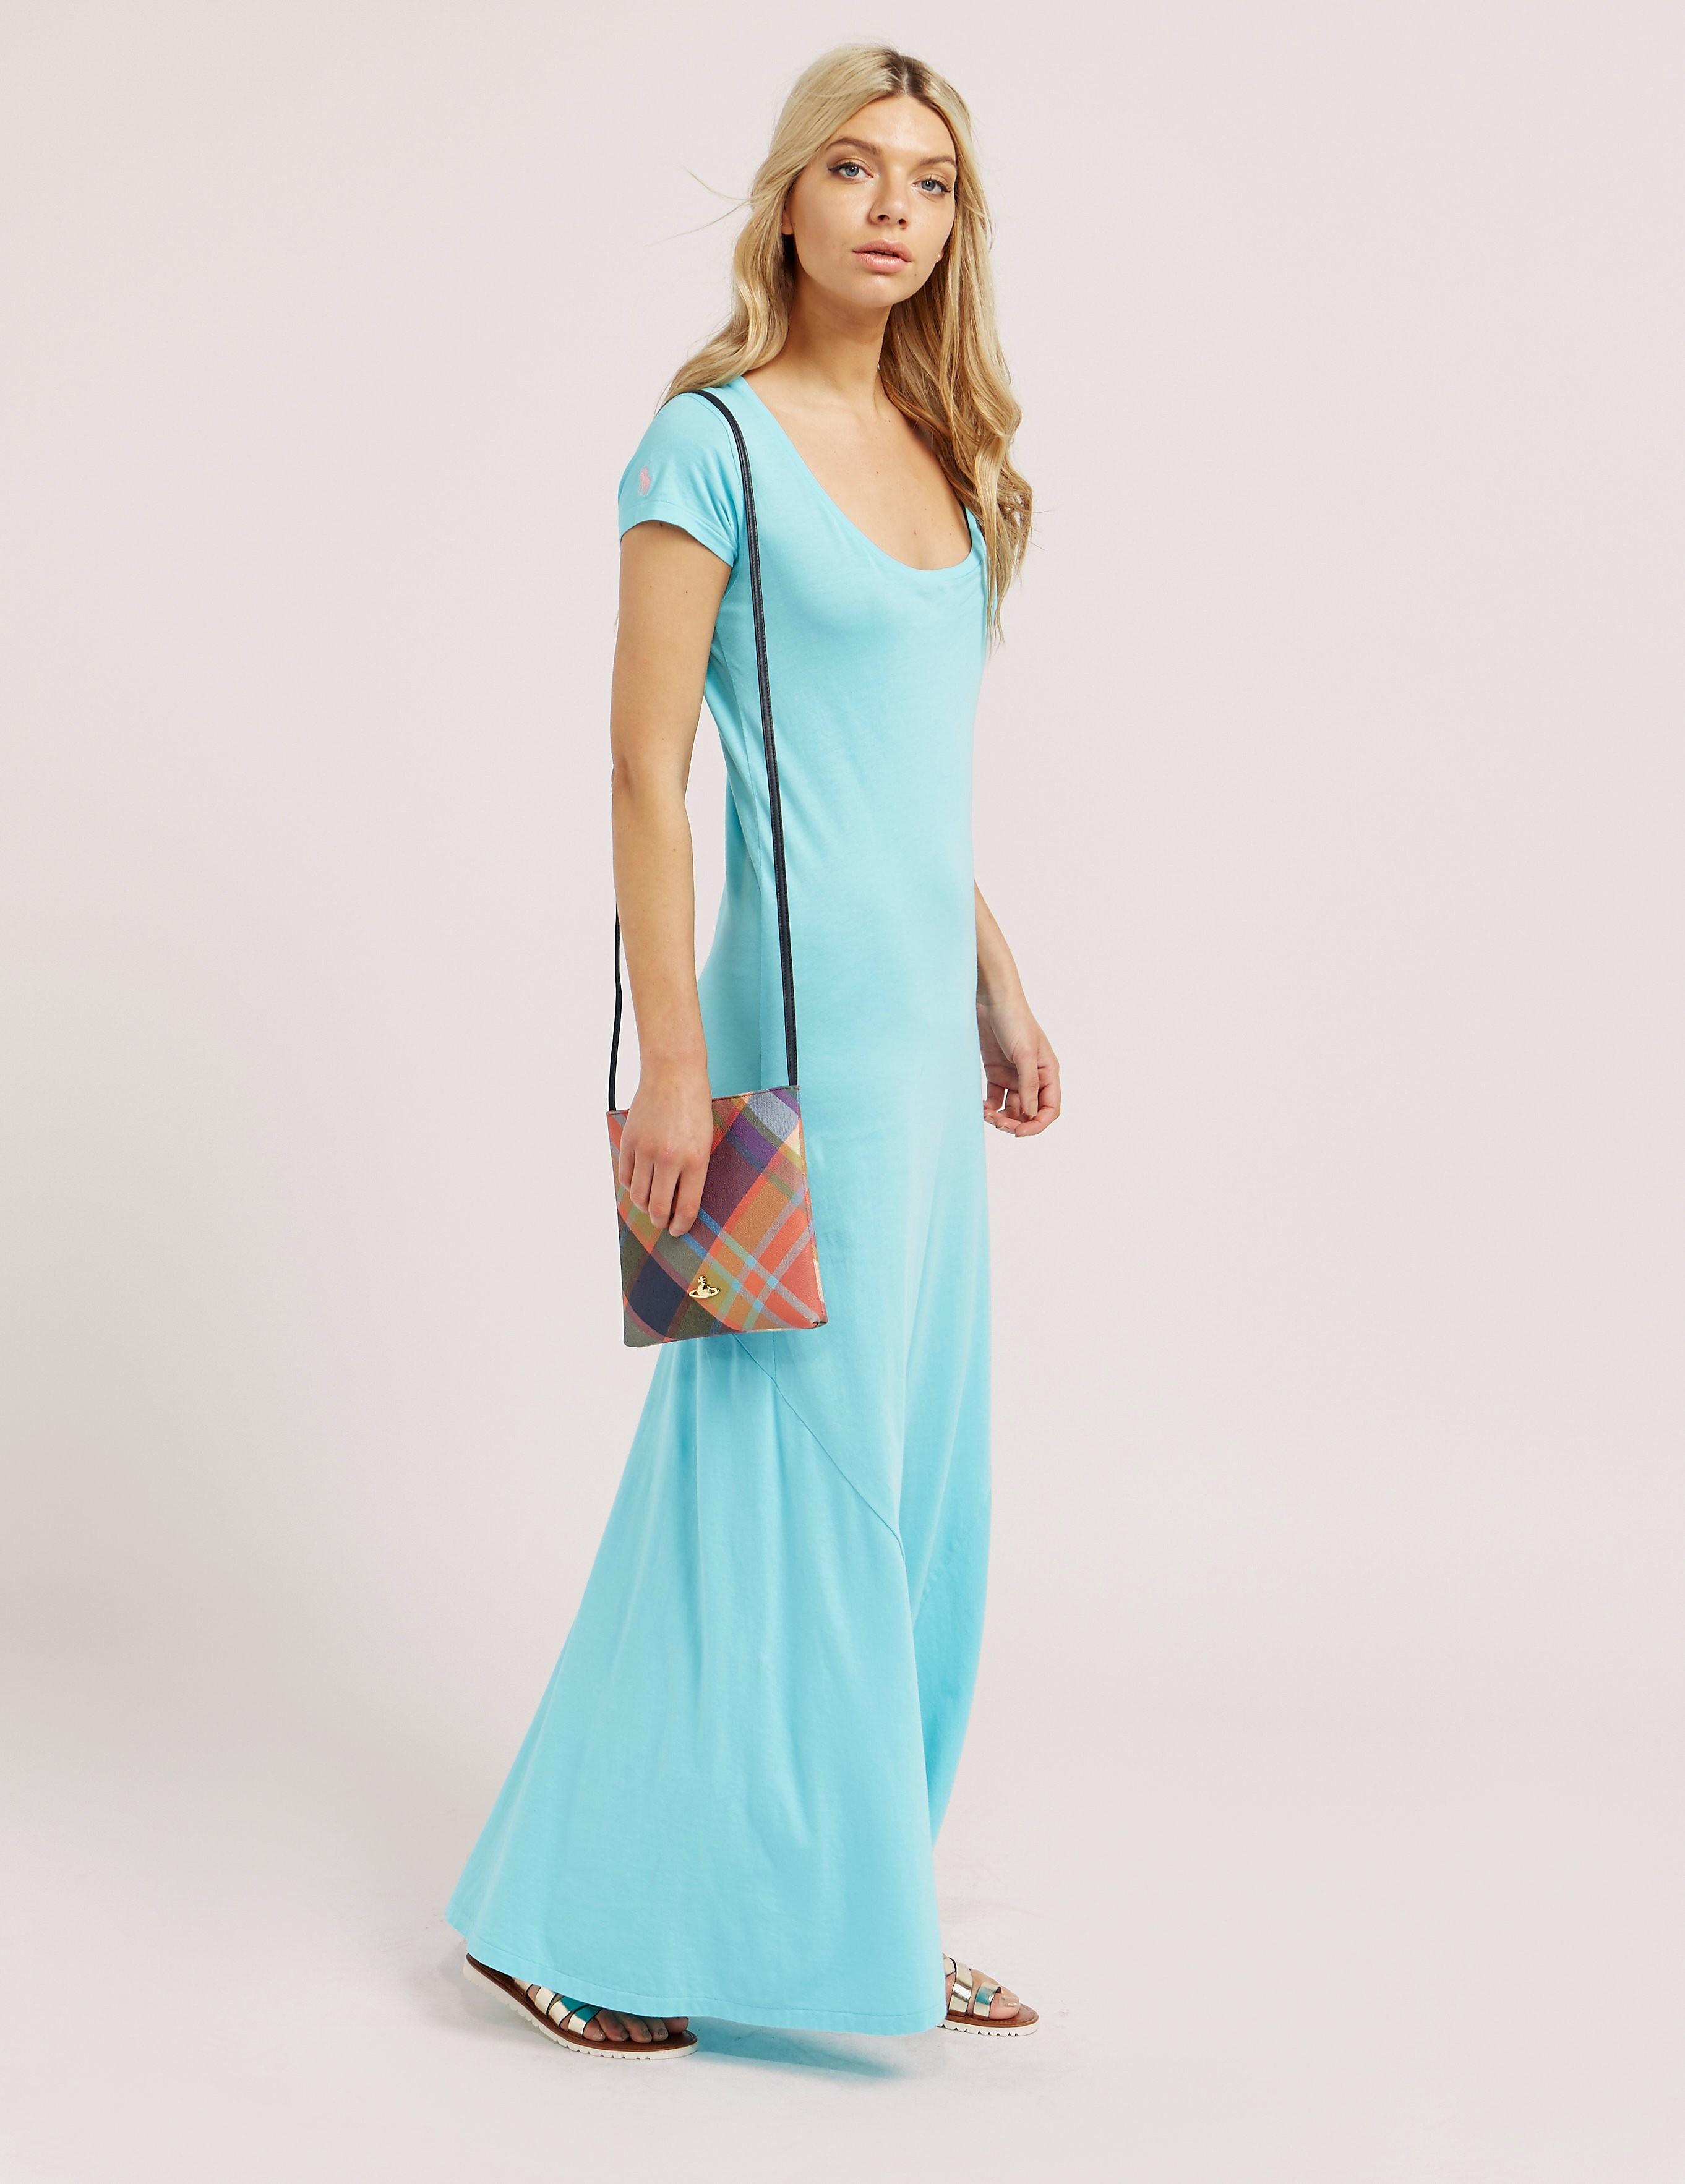 Polo Ralph Lauren Scoopneck Maxi Dress